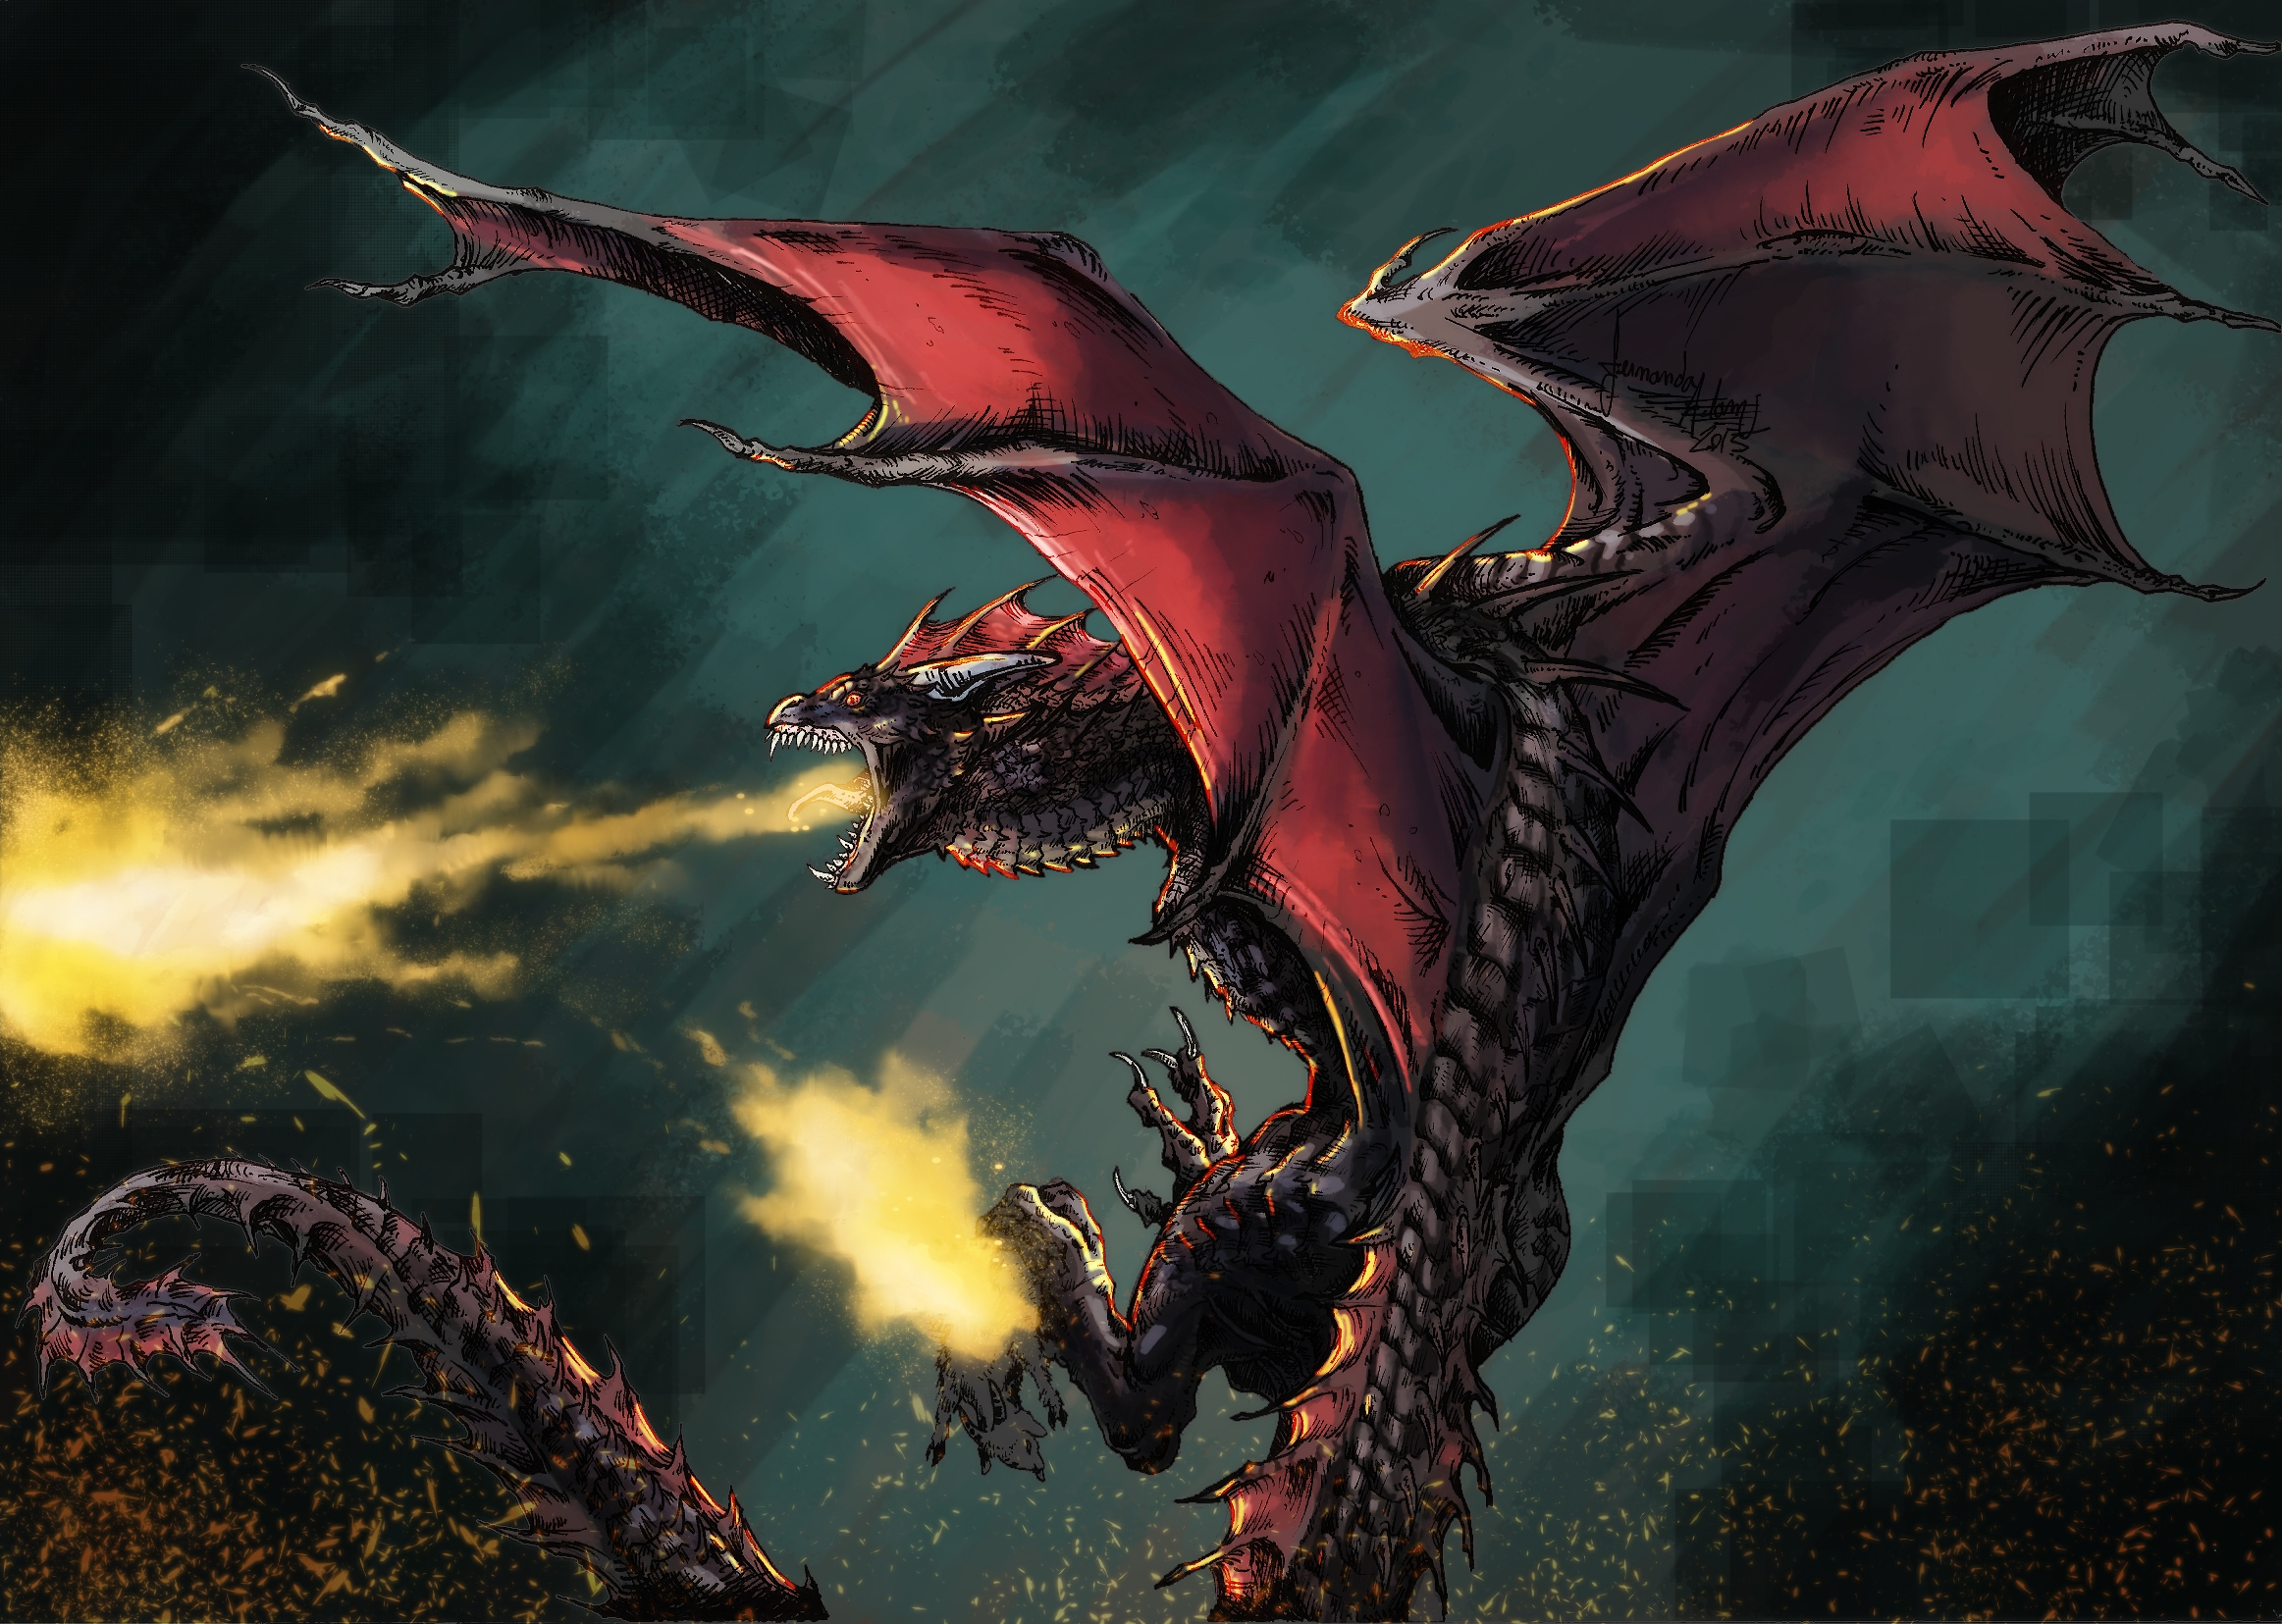 Fury - drawing, illustration, dragon - feradami | ello